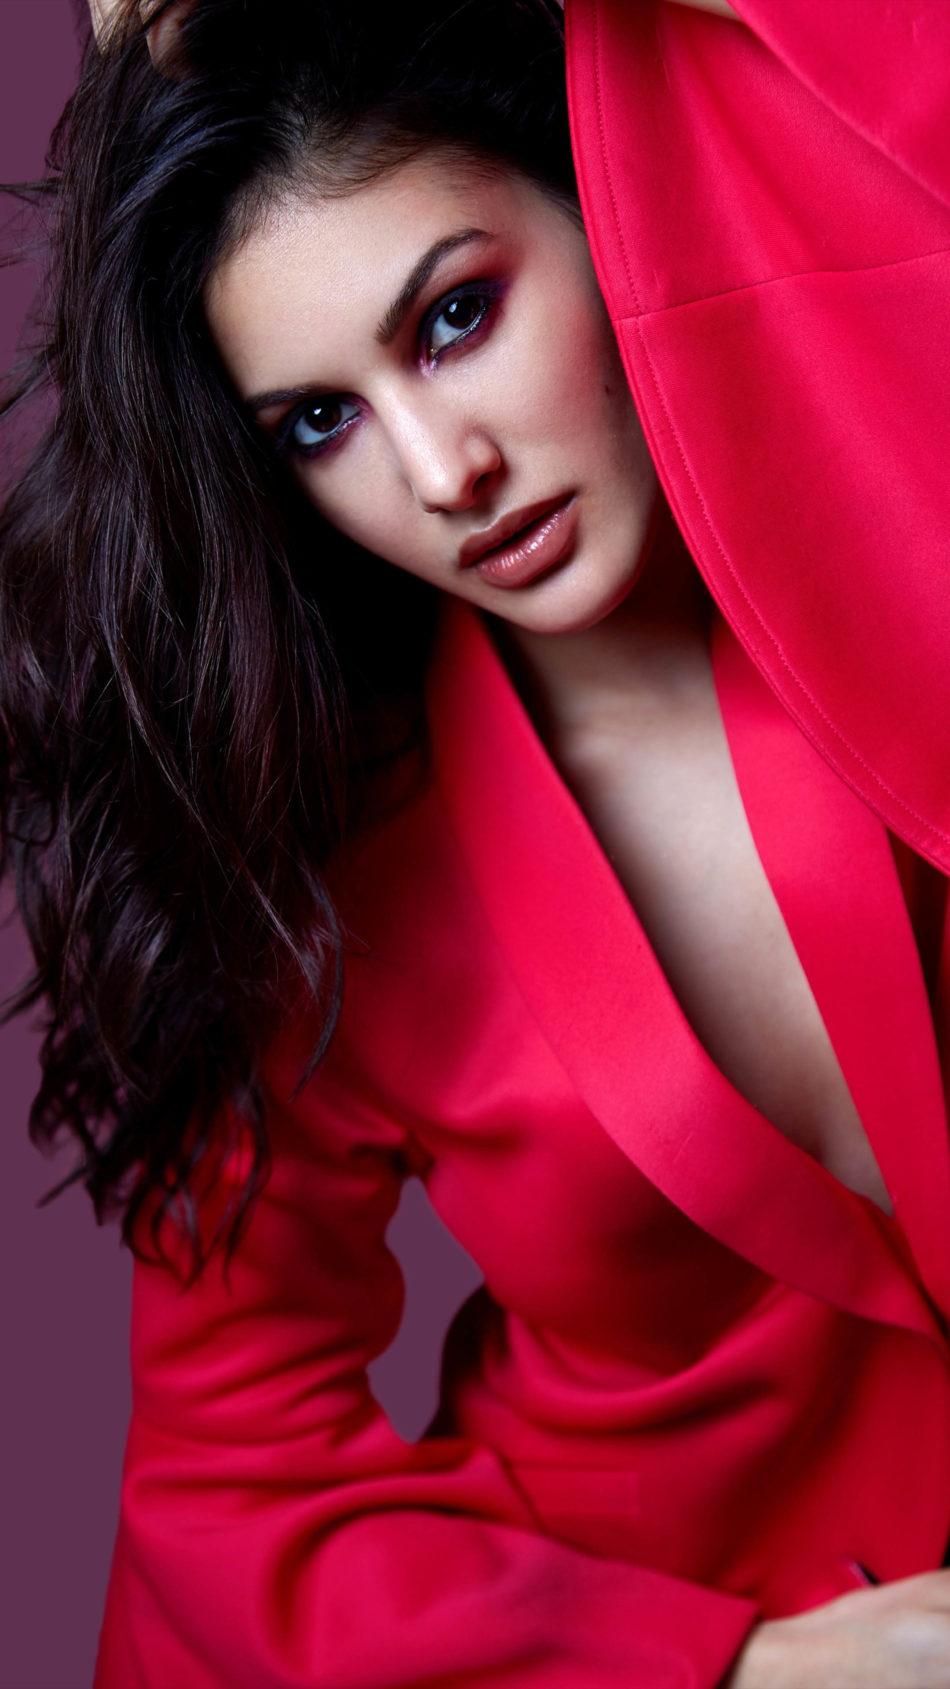 Beautiful Amyra Dastur In Red Dress 4K Ultra HD Mobile Wallpaper